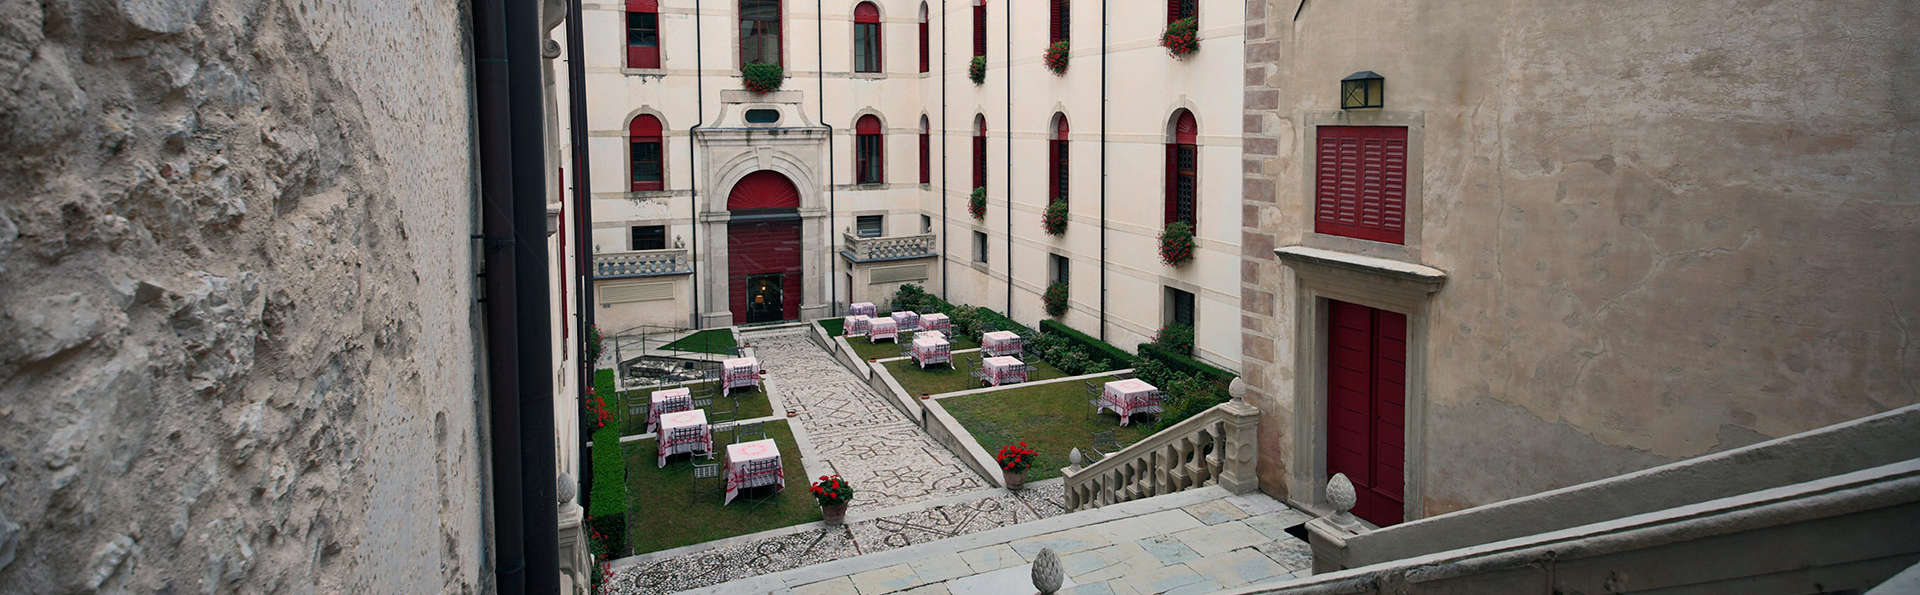 CastelBrando - EDIT_patio1.jpg